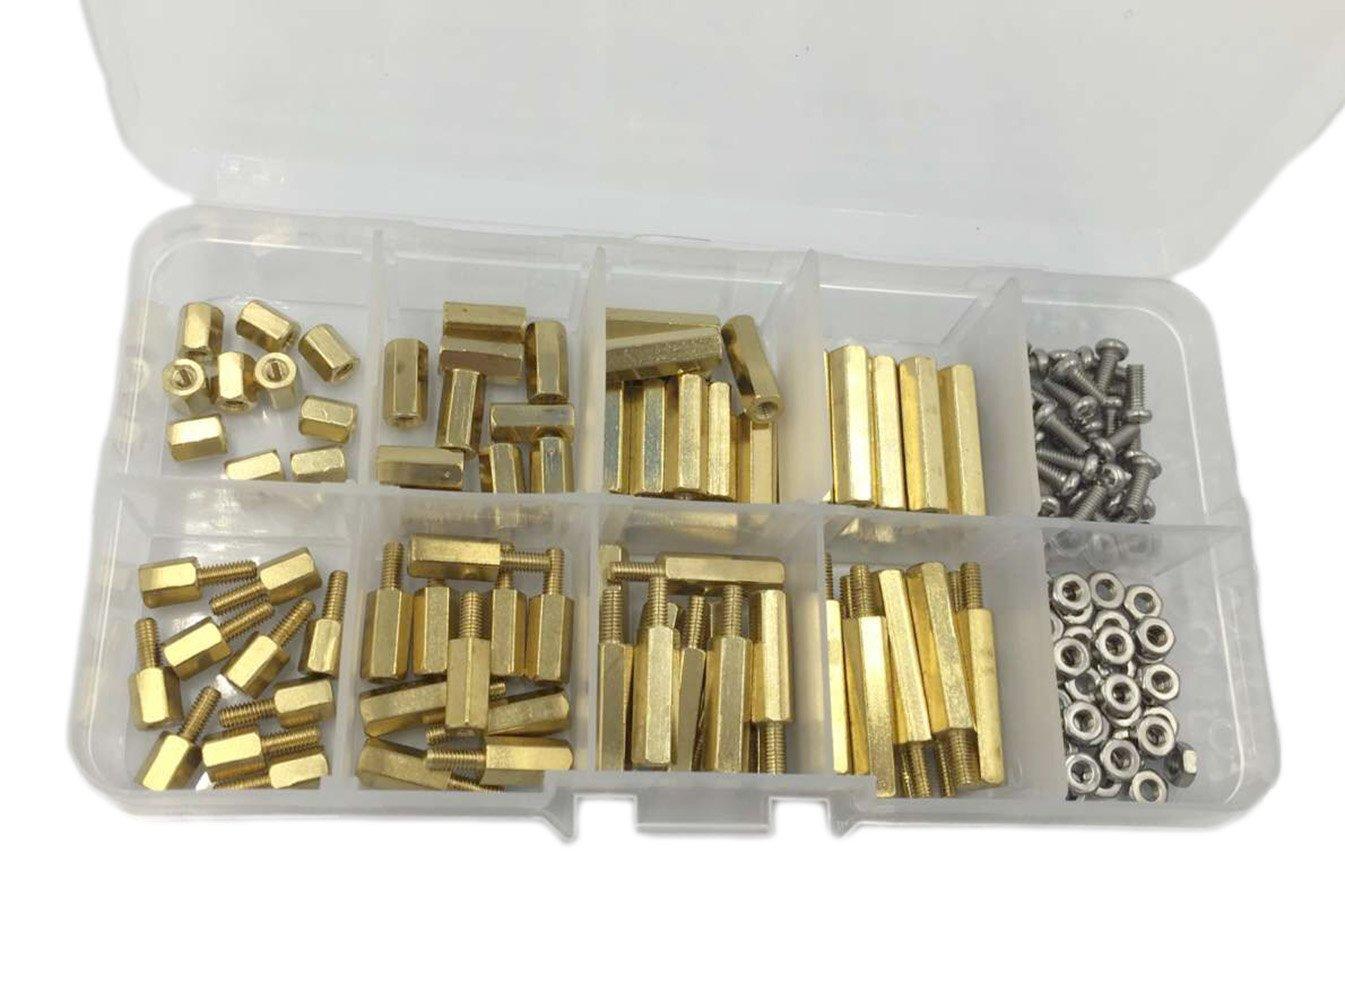 HVAZI 160PCS M2.5 Brass Spacer Standoff/Stainless Steel Screw/Nut Assortment Kit,Male-Female